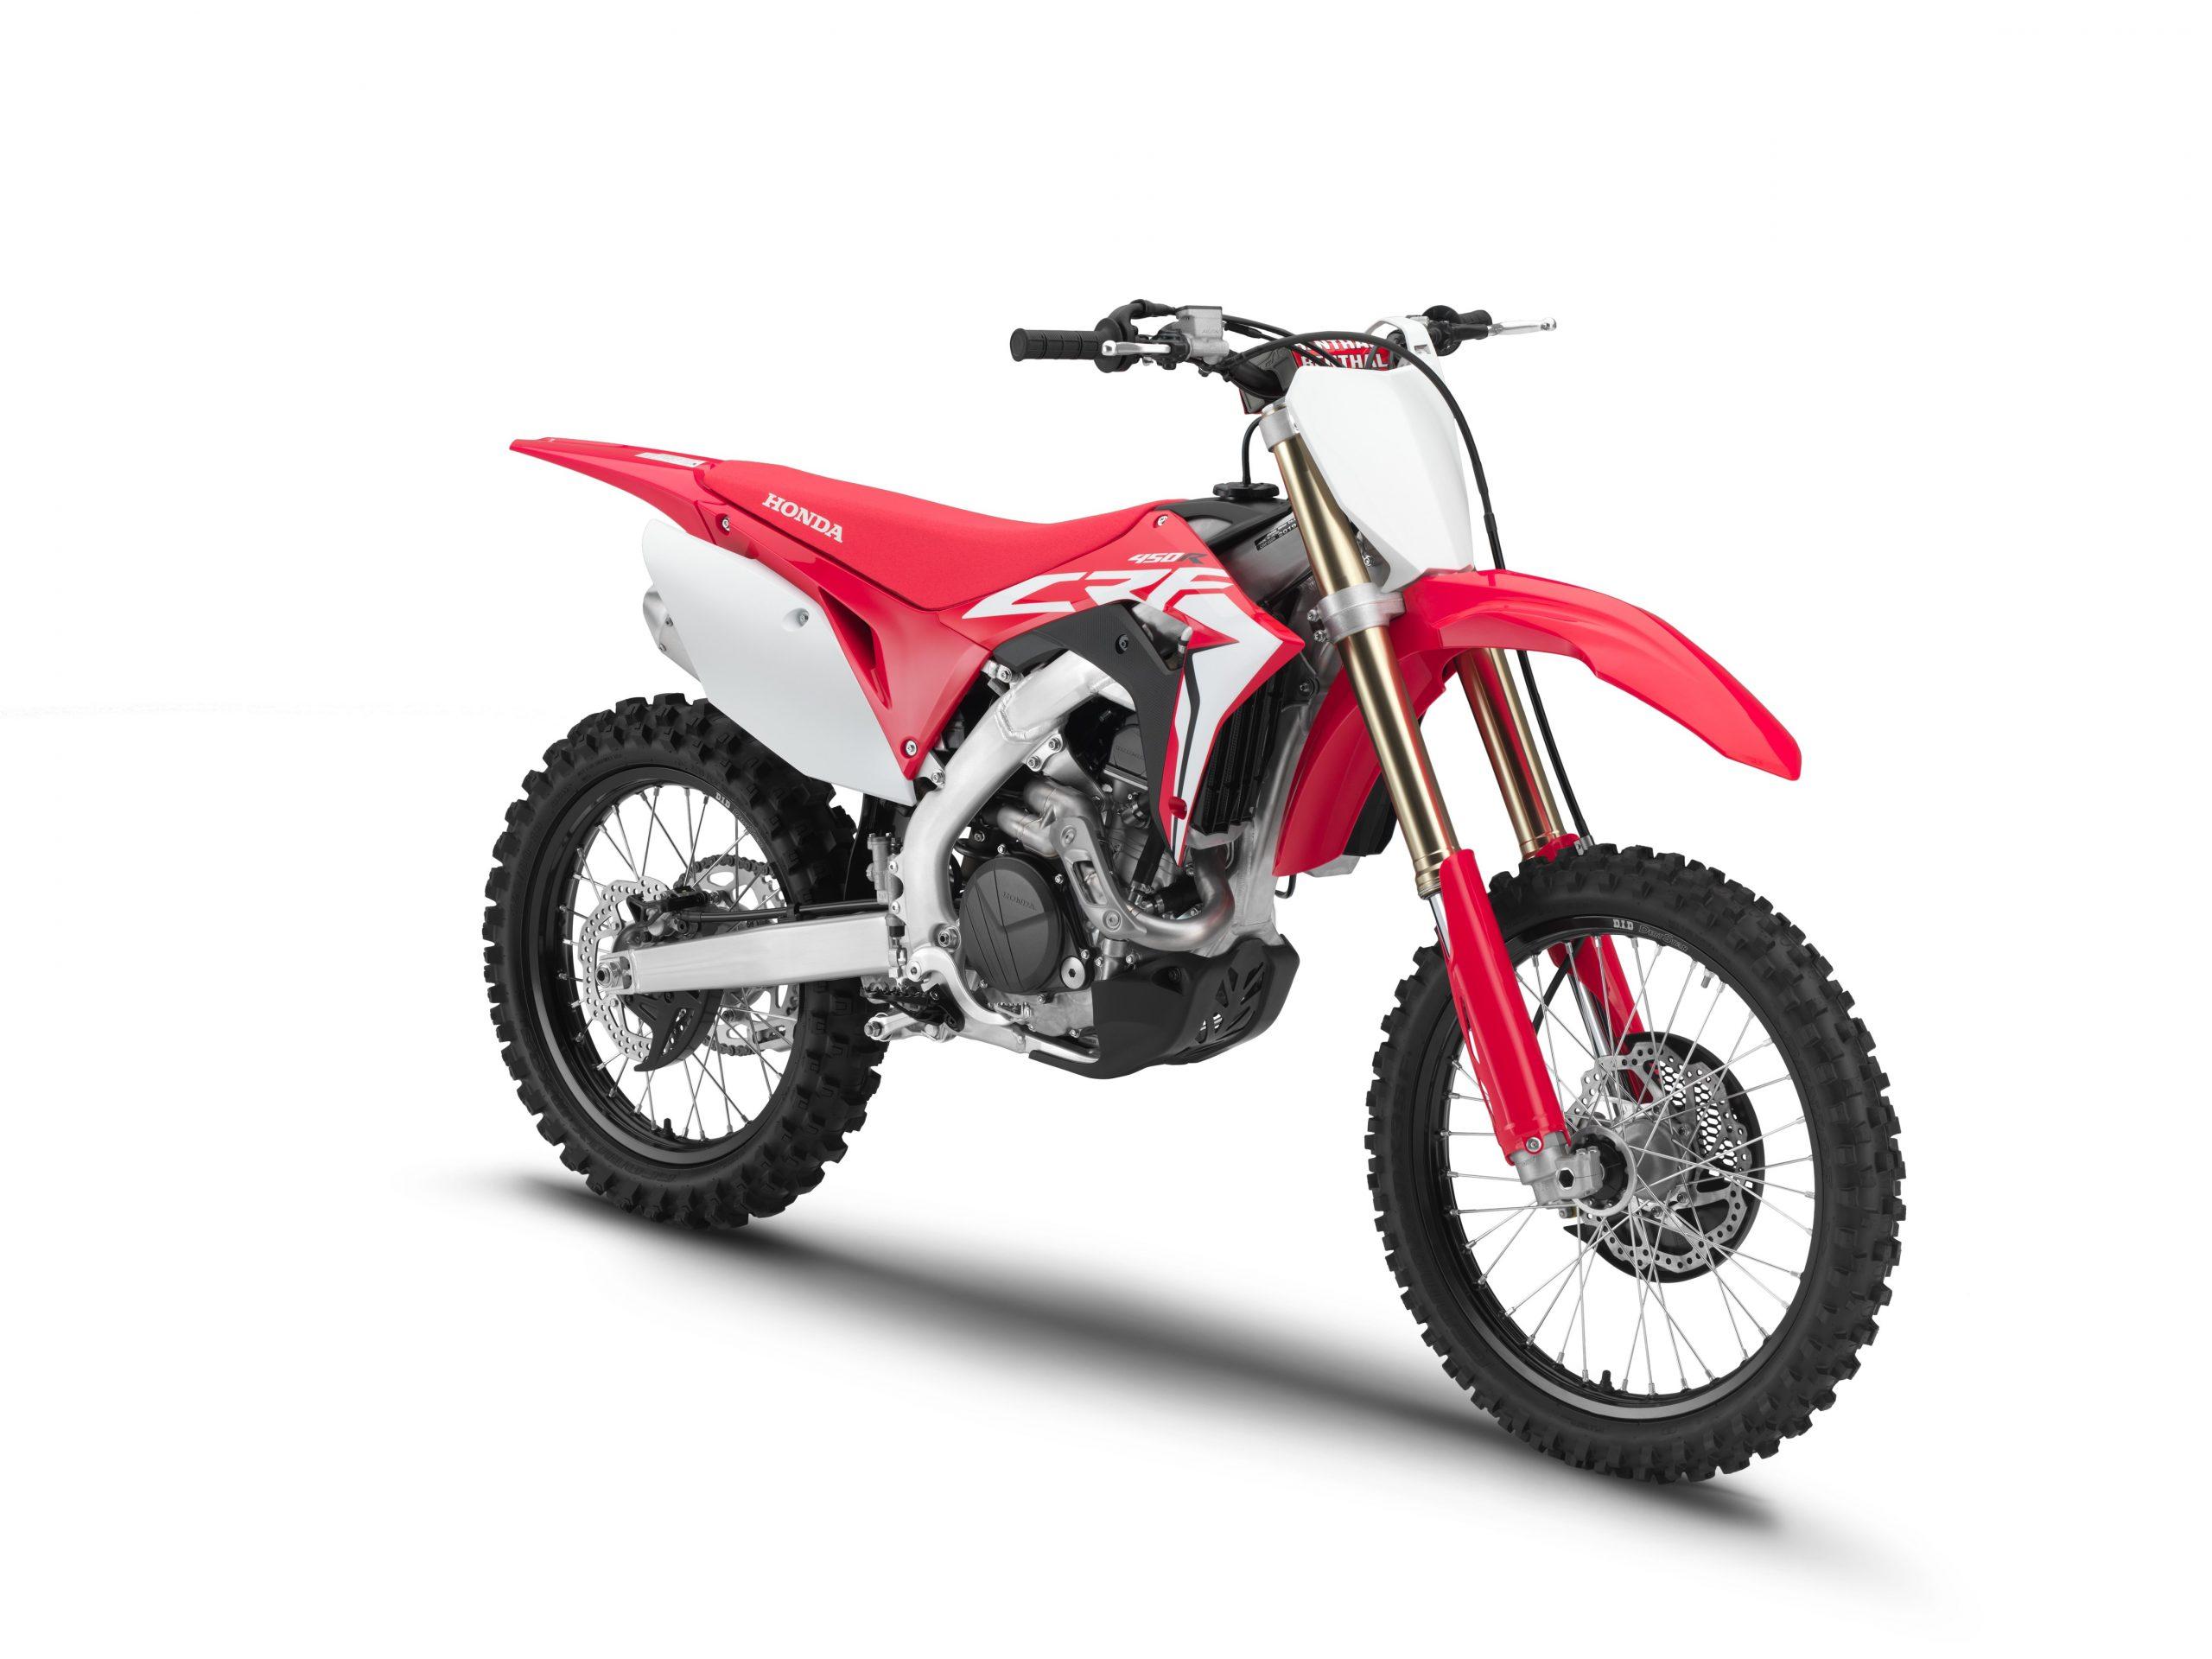 Motorbike types, Motocross, 2019 Honda CRF450R